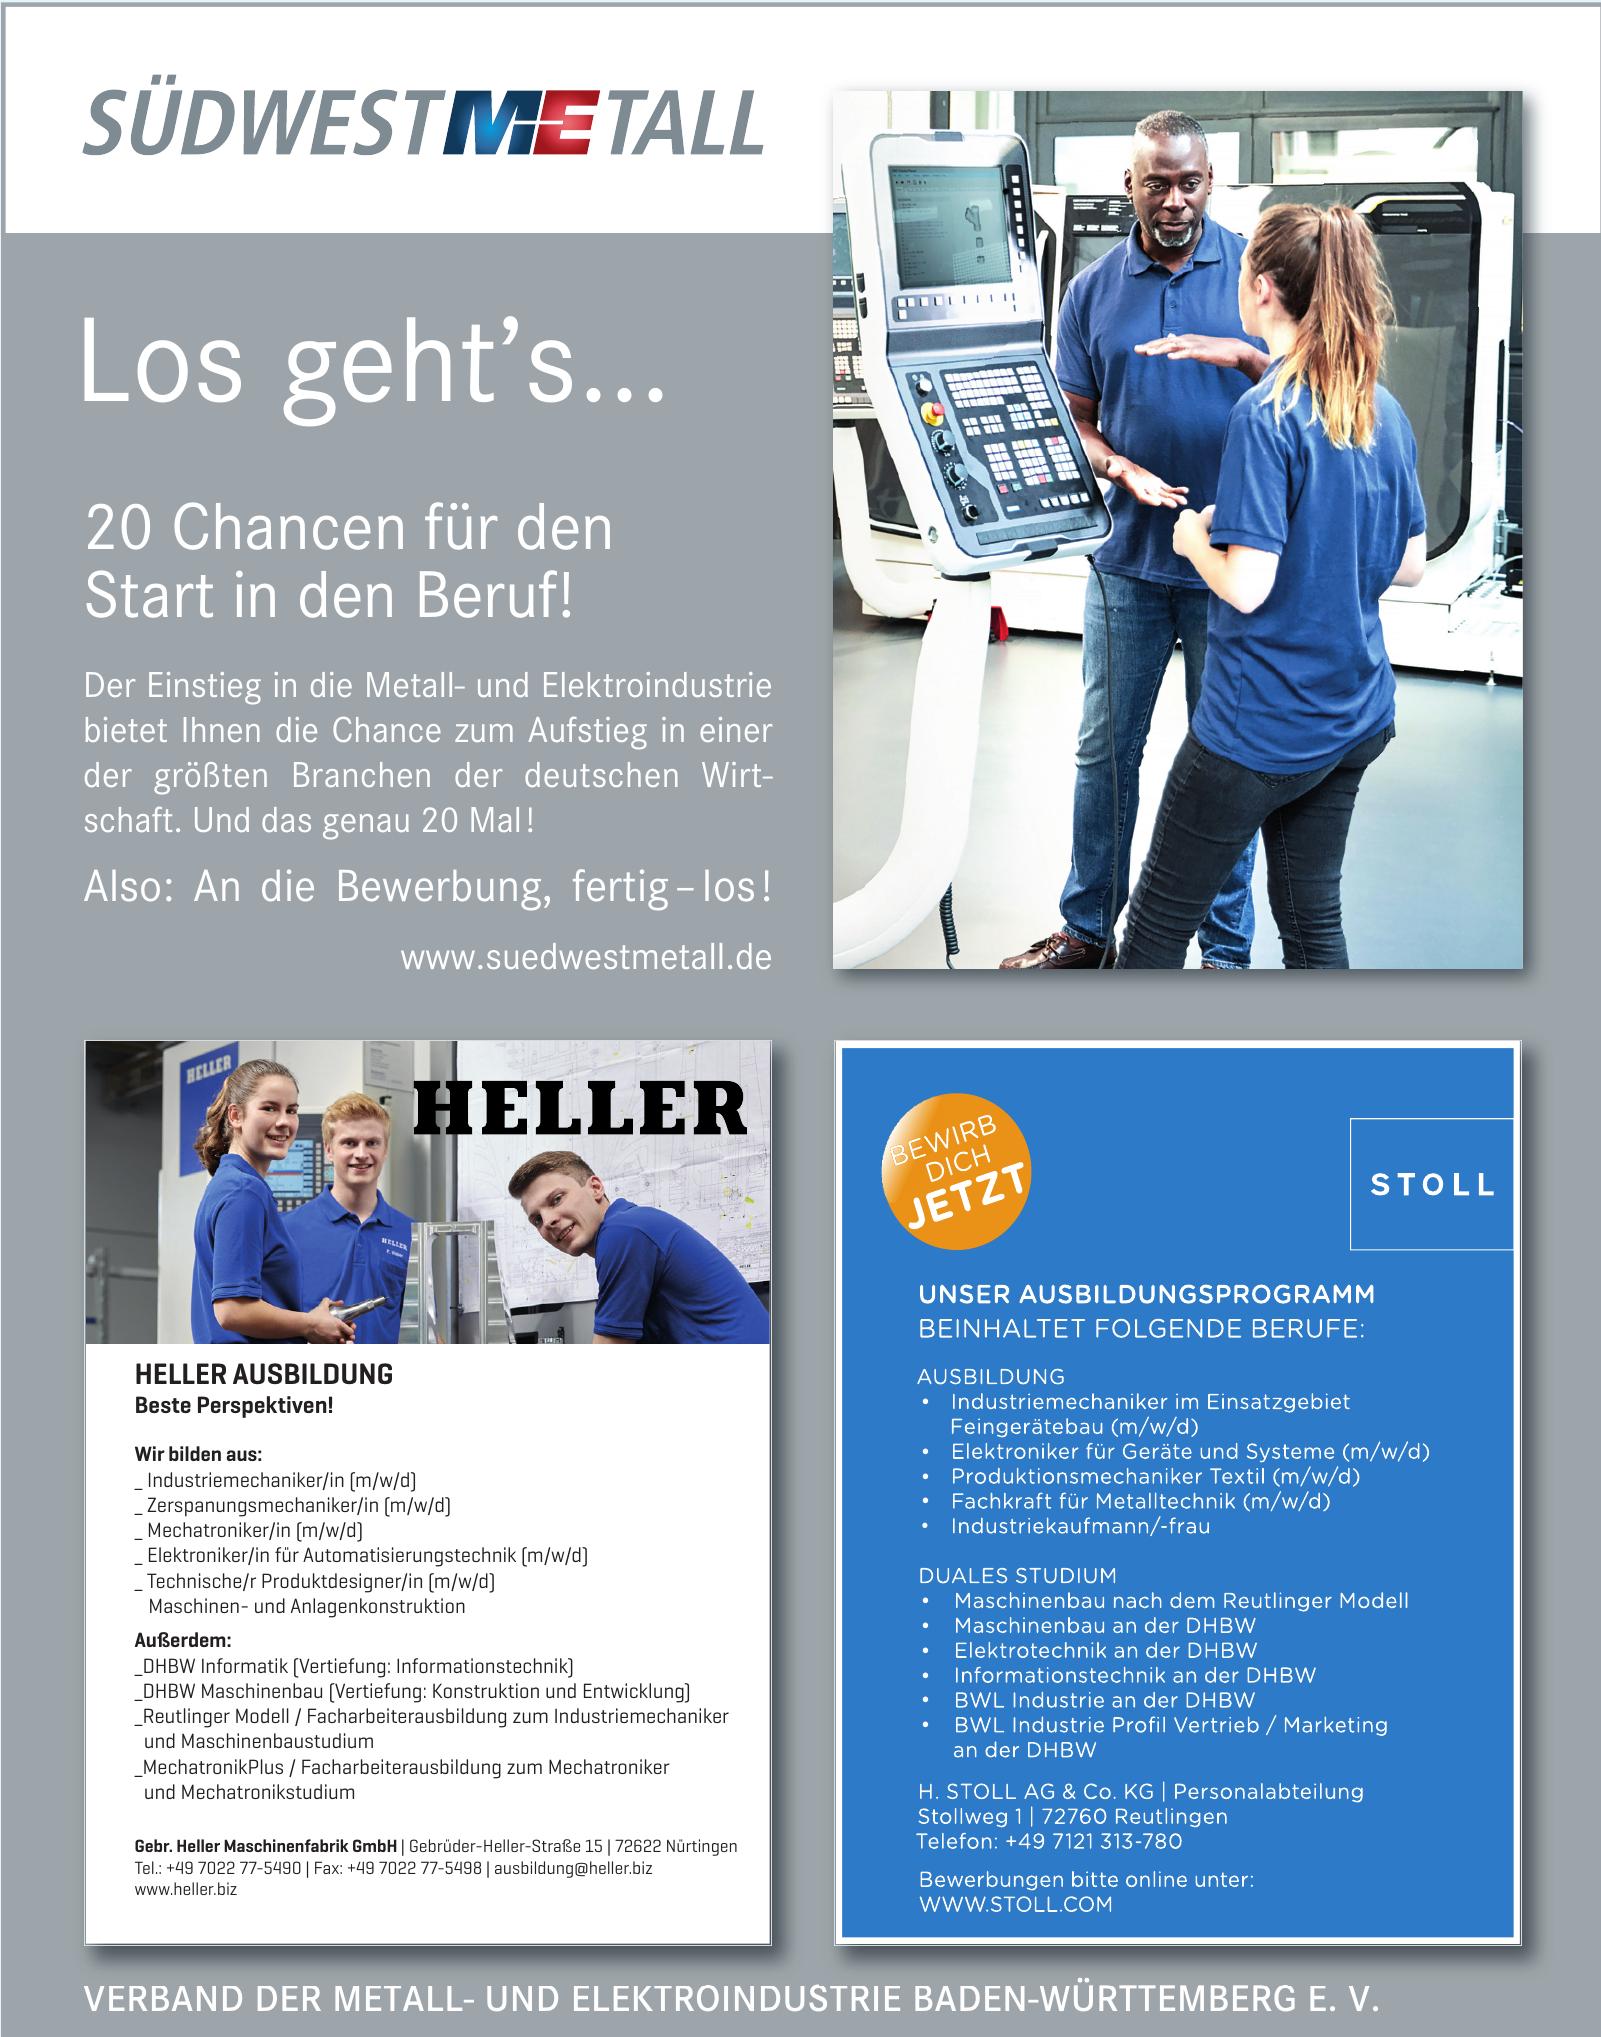 Verband der Metall- und Elektroindustrie Baden-Württemberg e. V. (Südwestmetall)